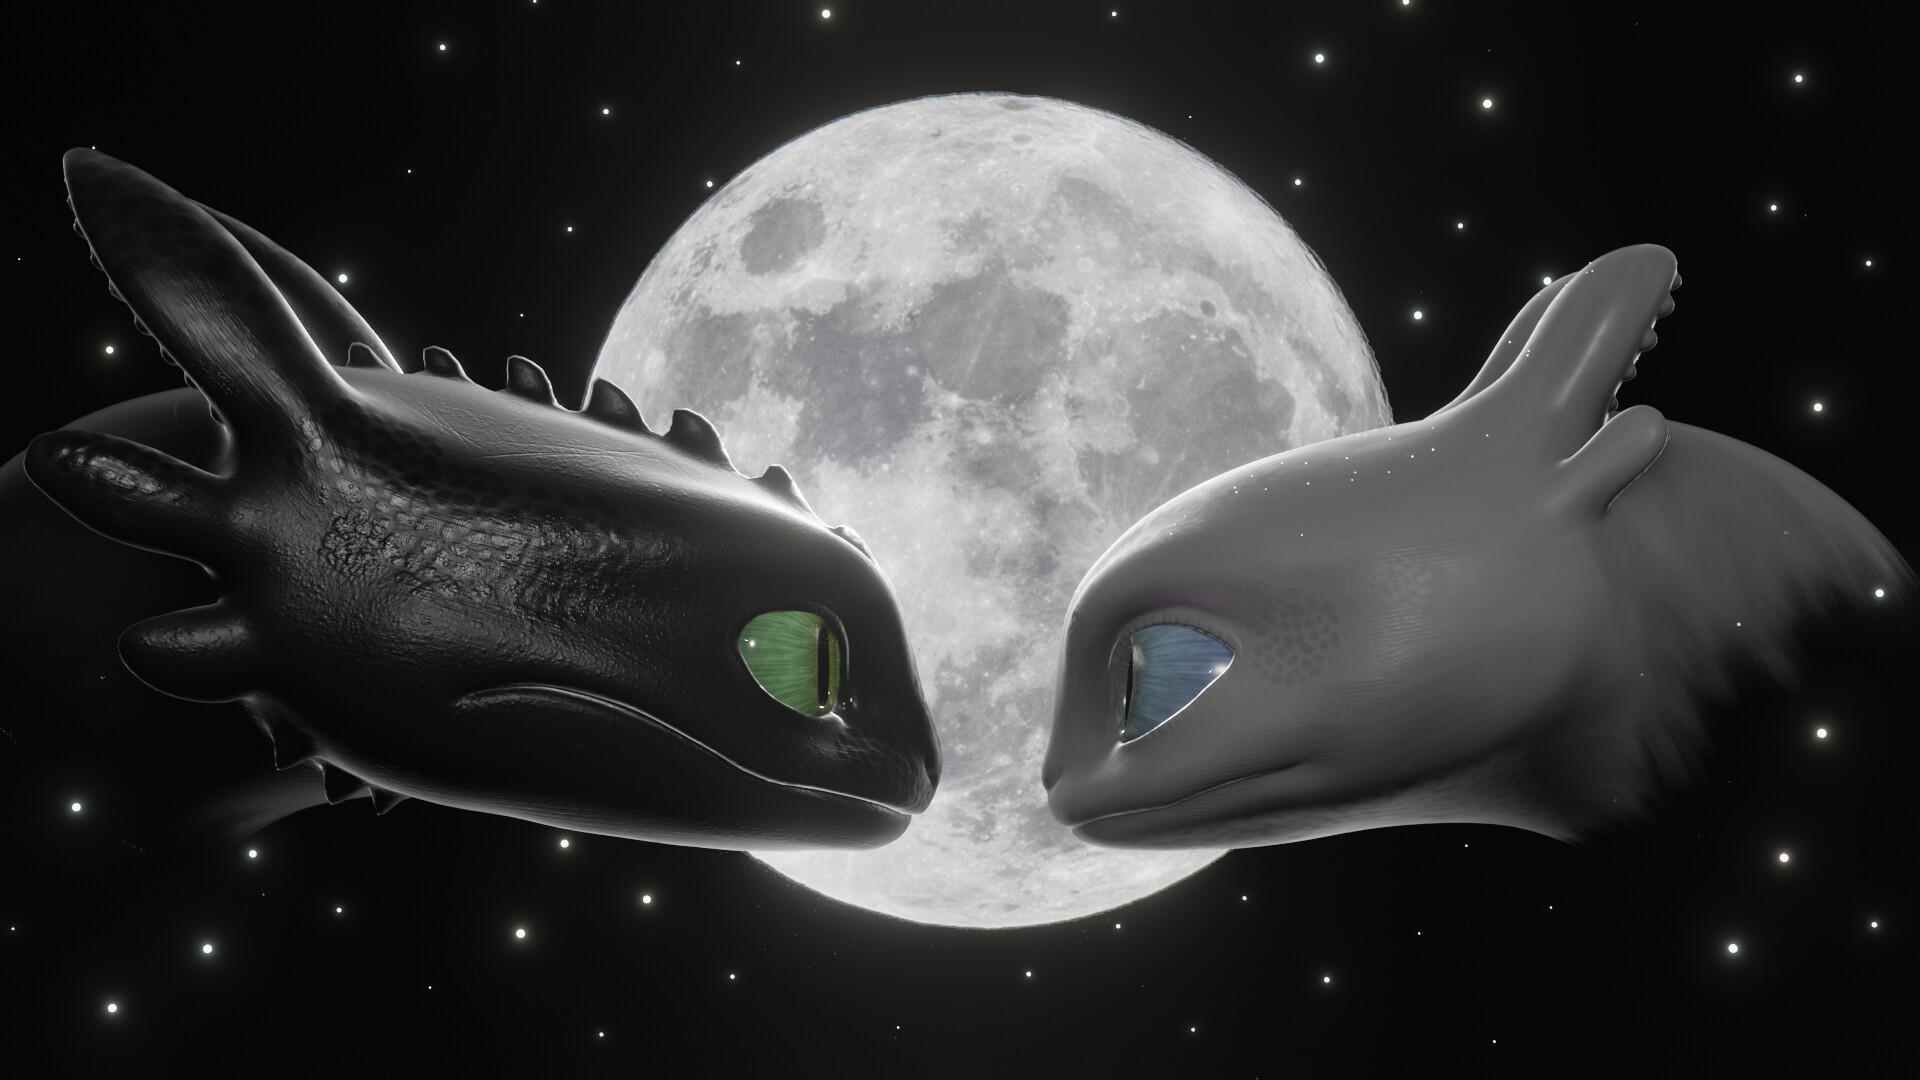 ArtStation - Toothless and Light Fury, Matheus Evangelista